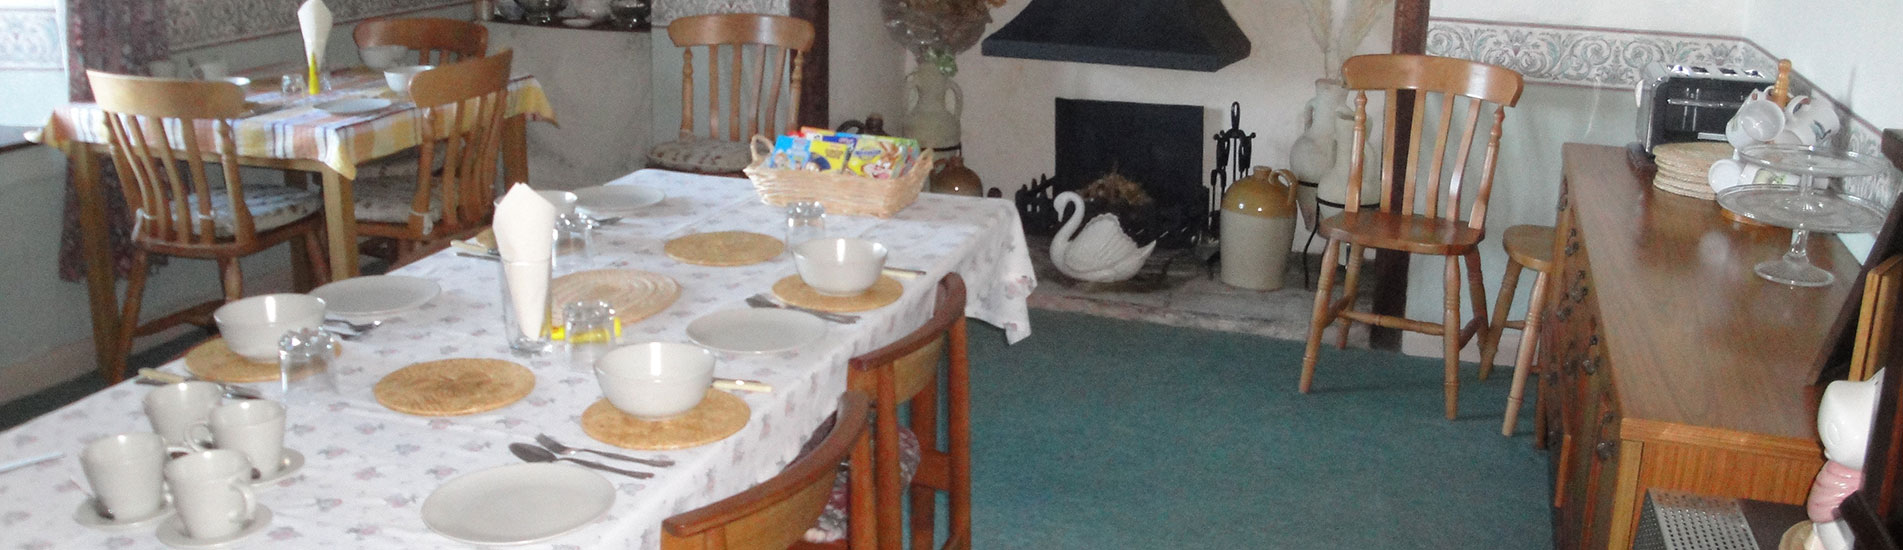 Kimbland Farm Dining Room